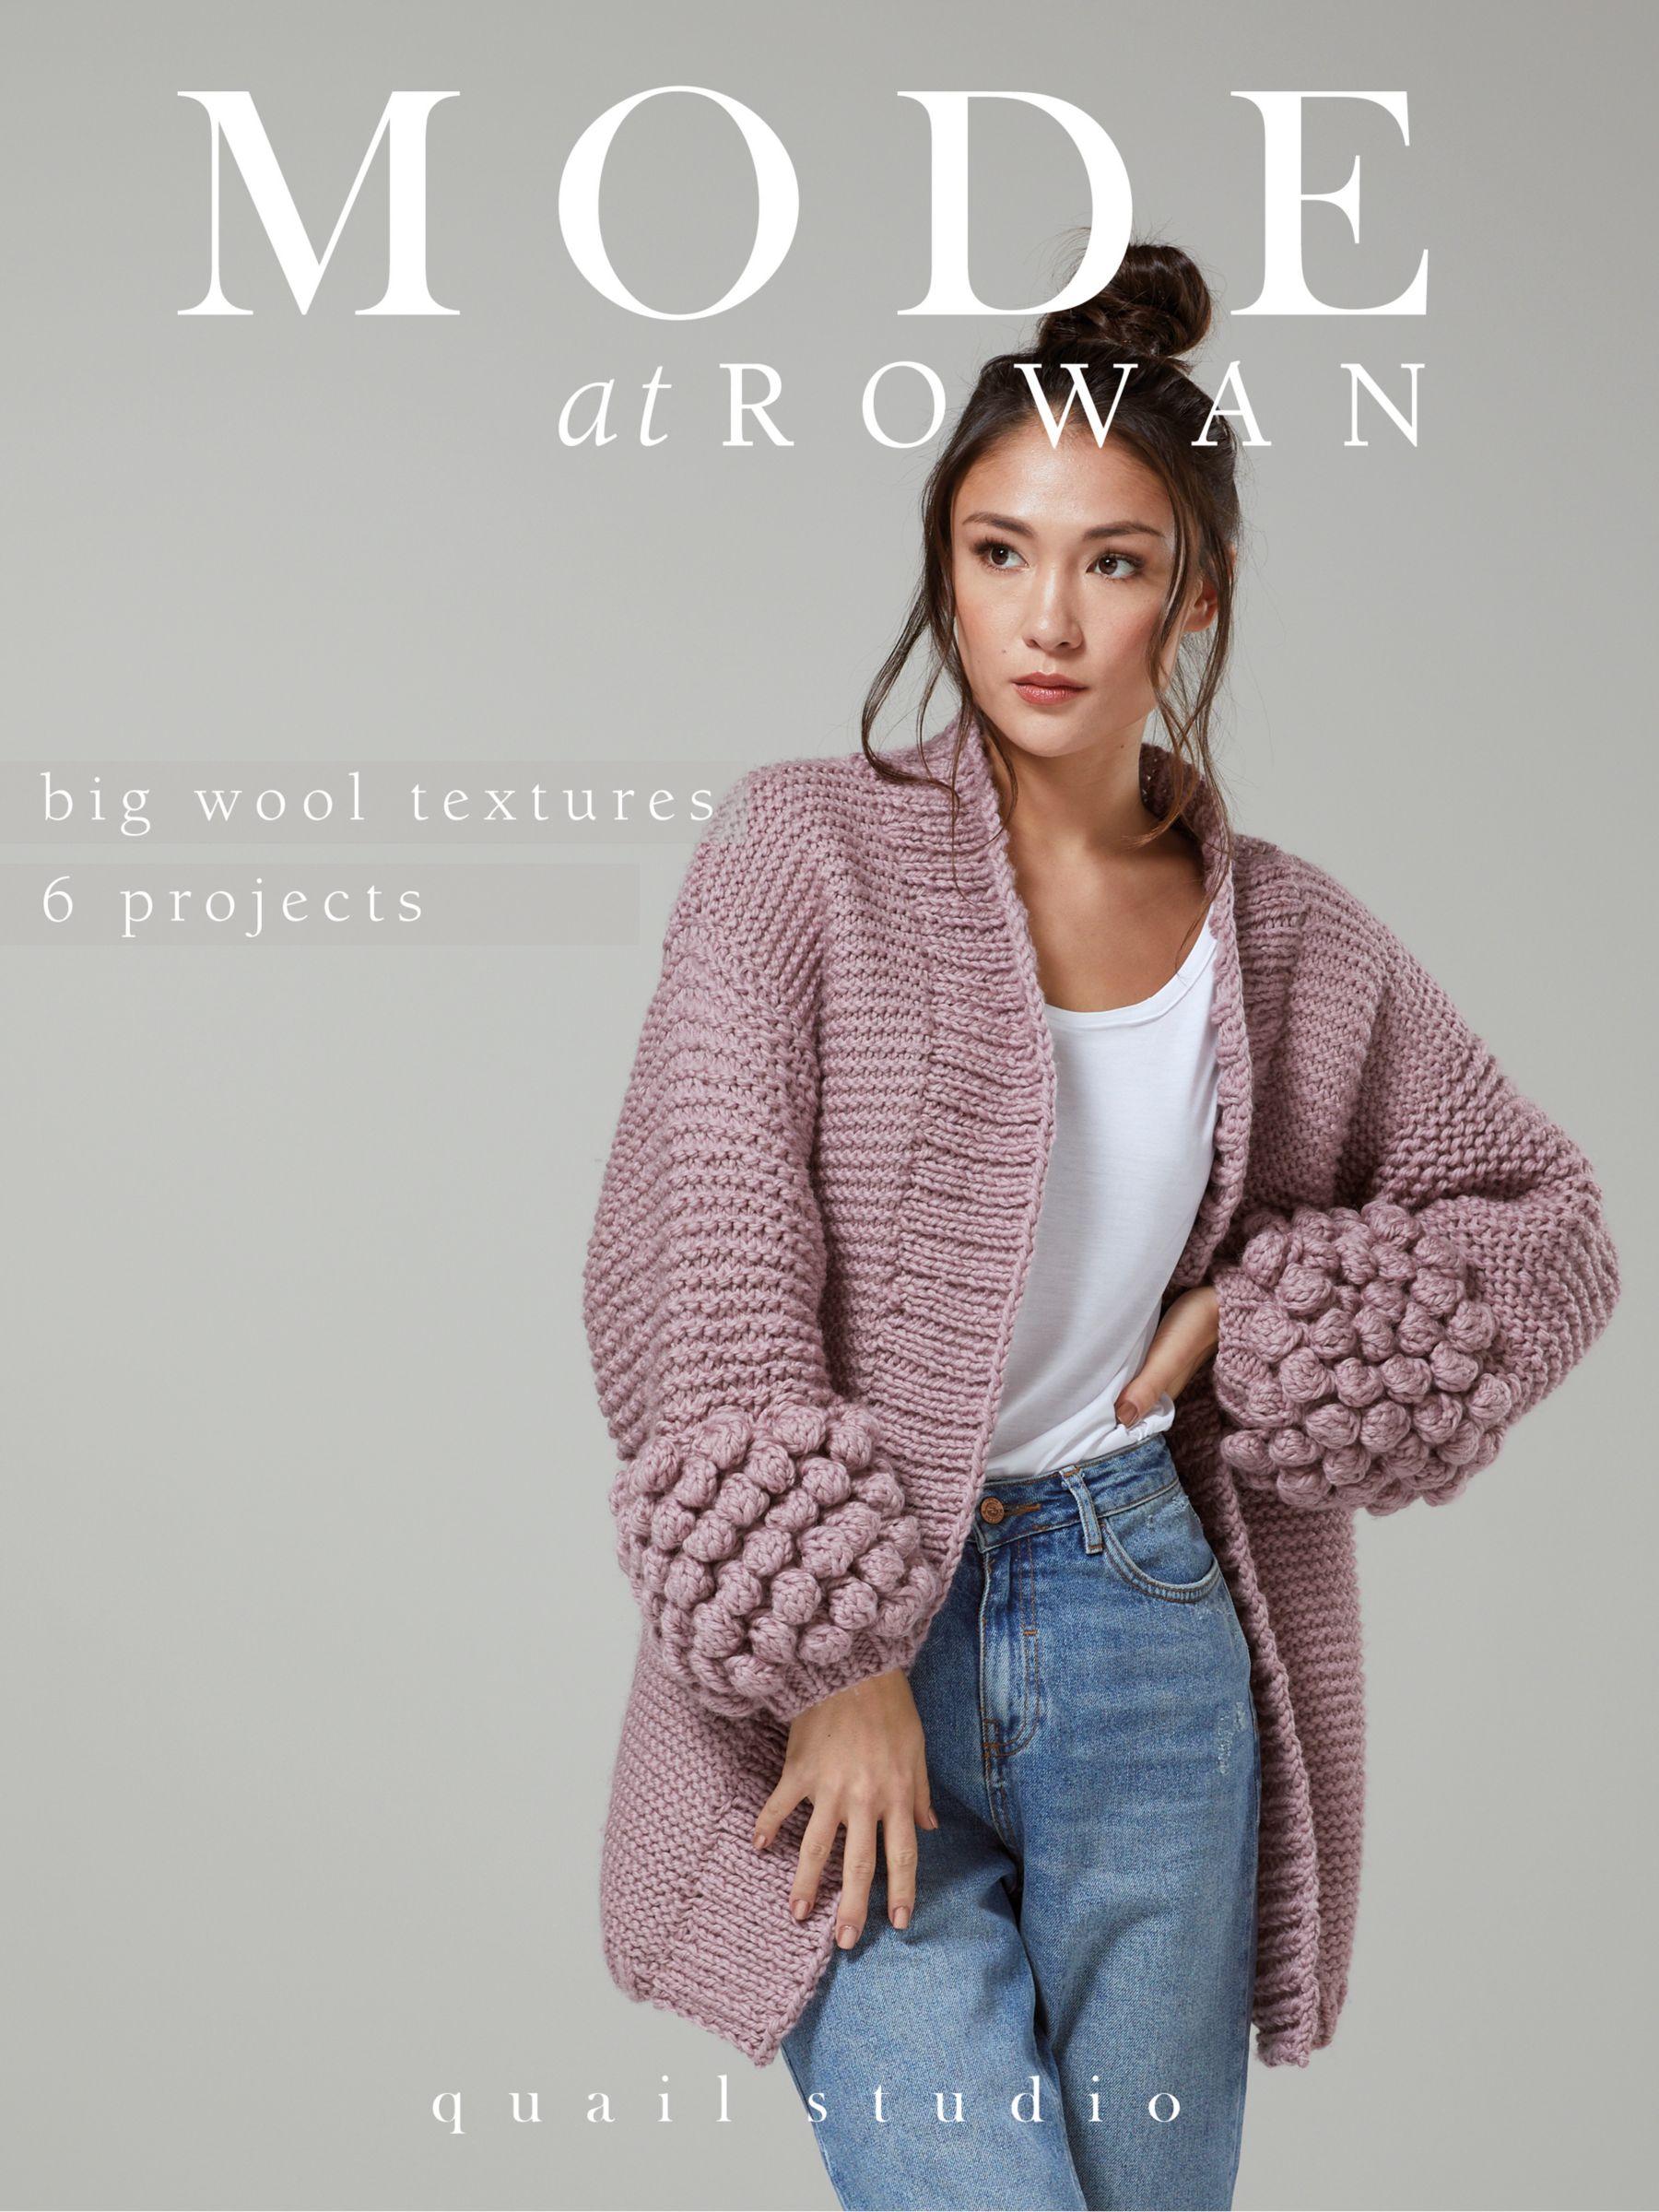 Rowan Rowan Big Wool Textures Knitting Projects Magazine